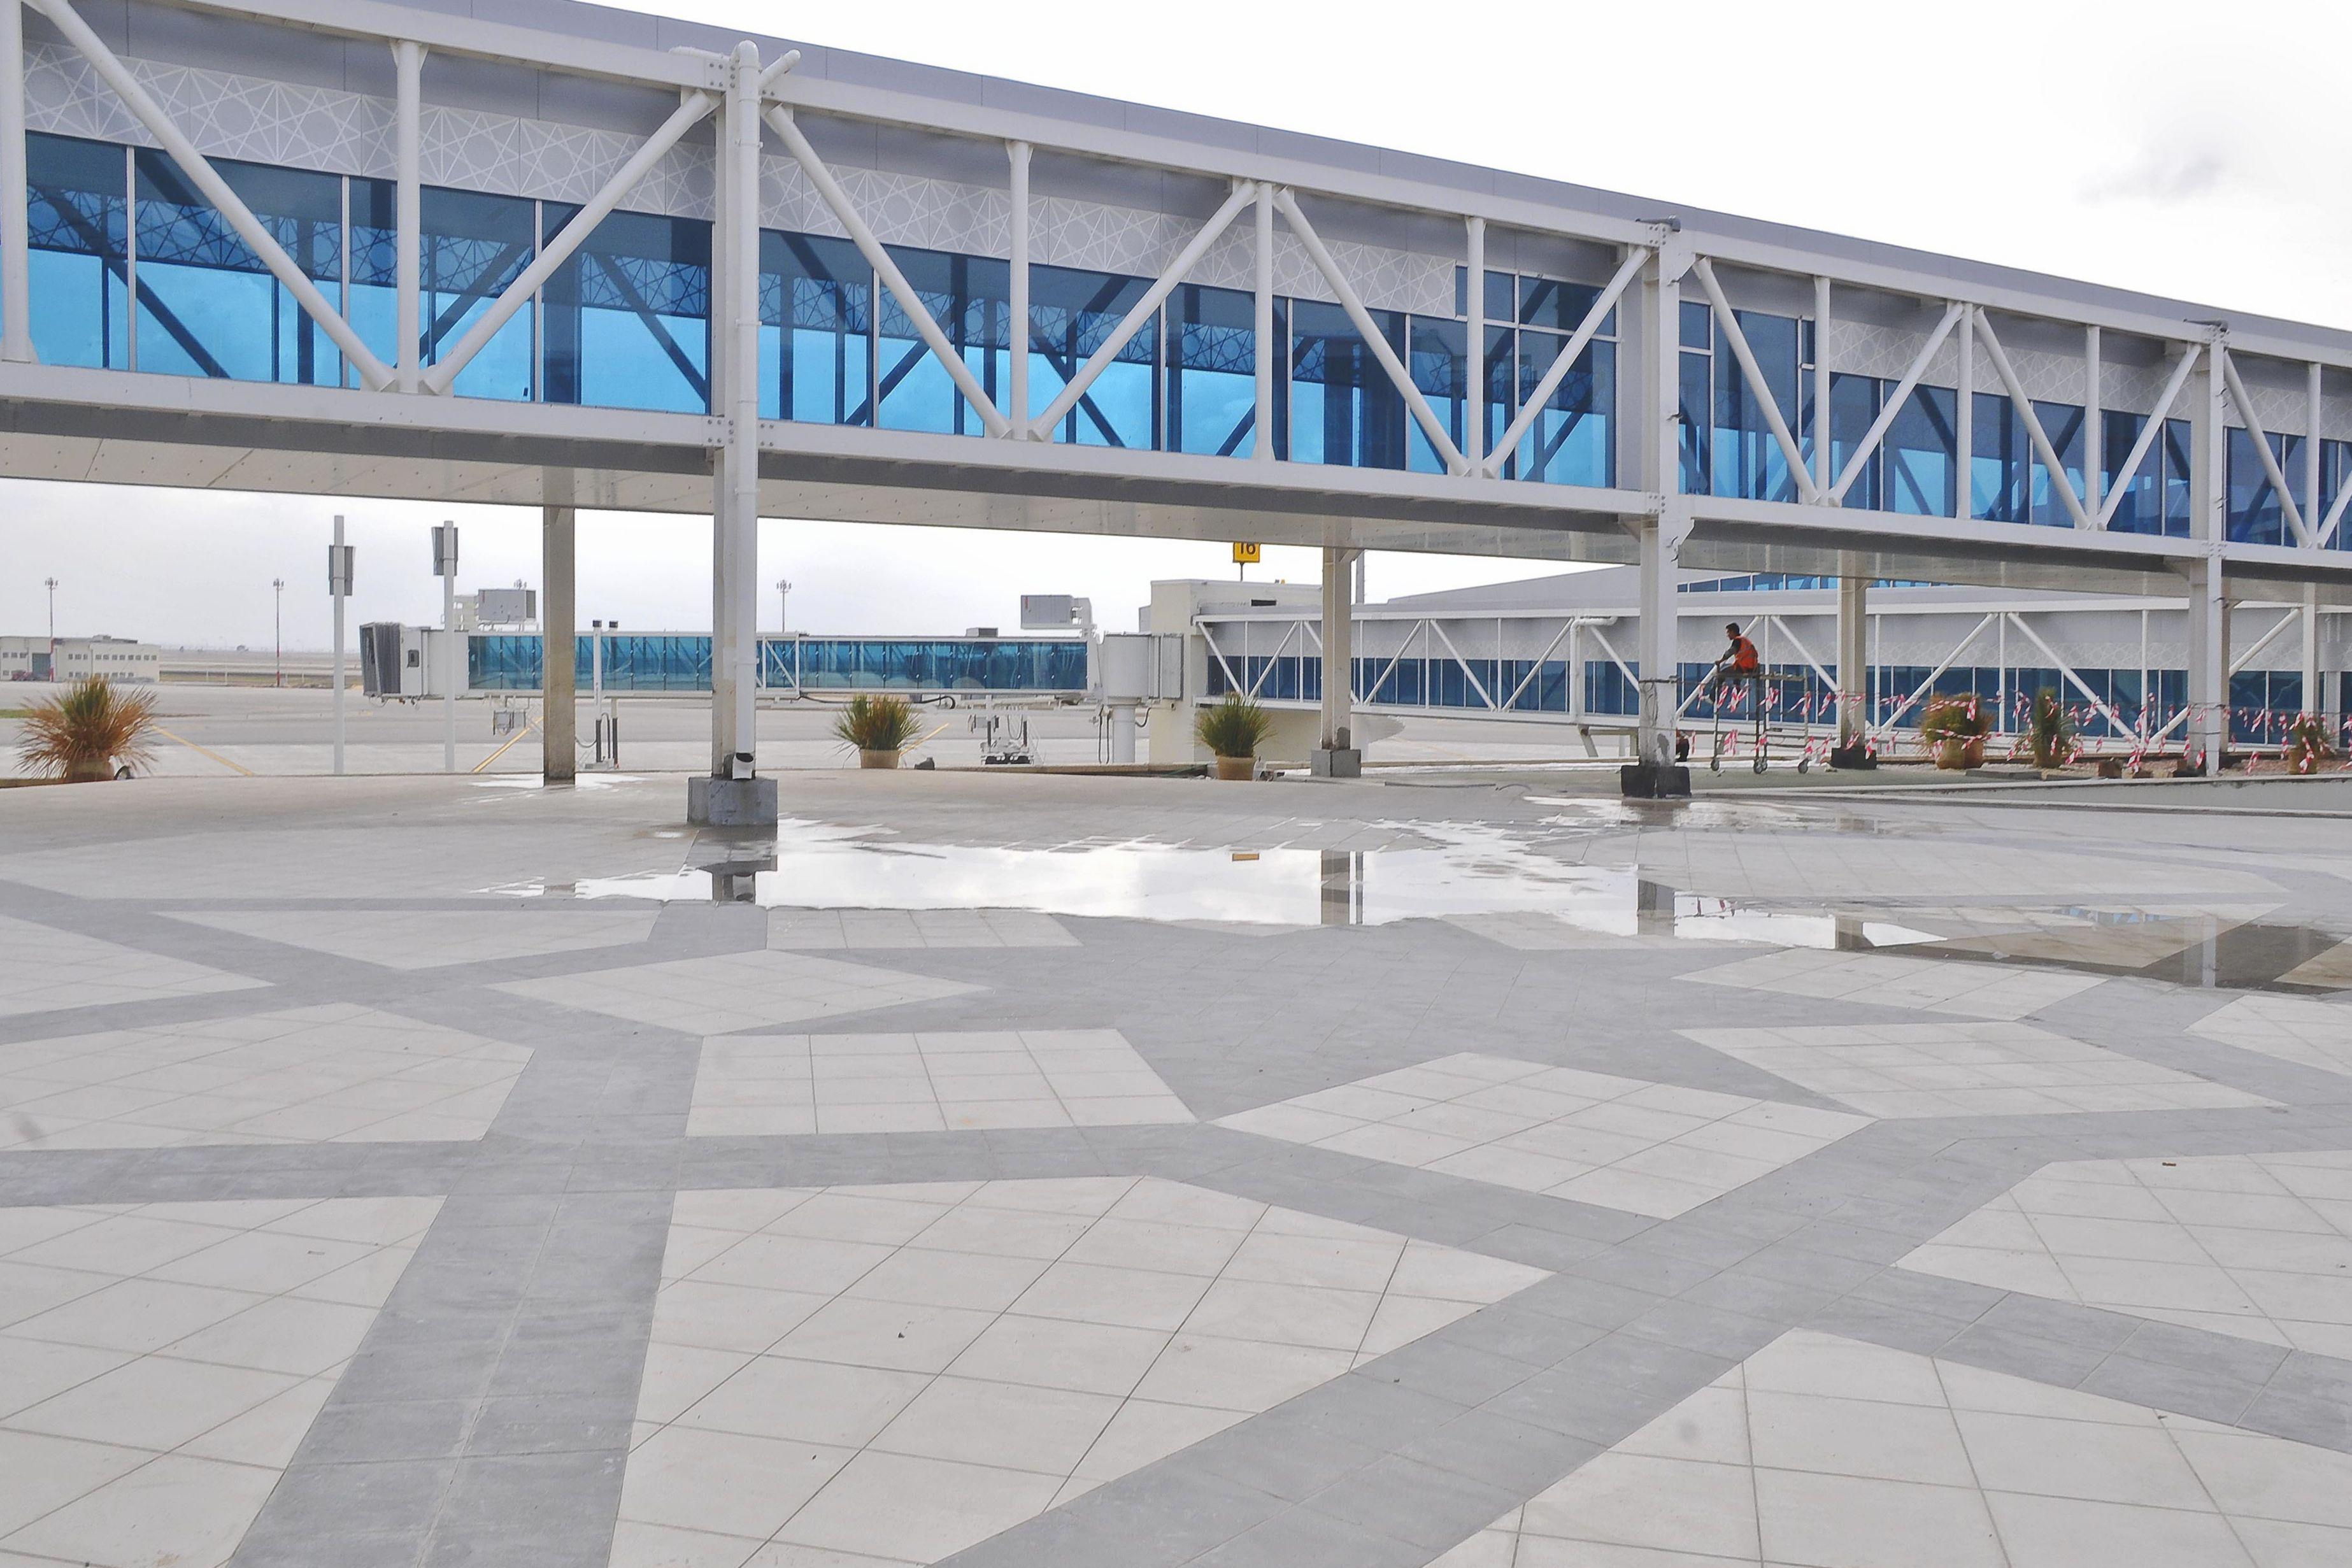 Passanger boarding bridge at the Enfidha Airport in Tunisia